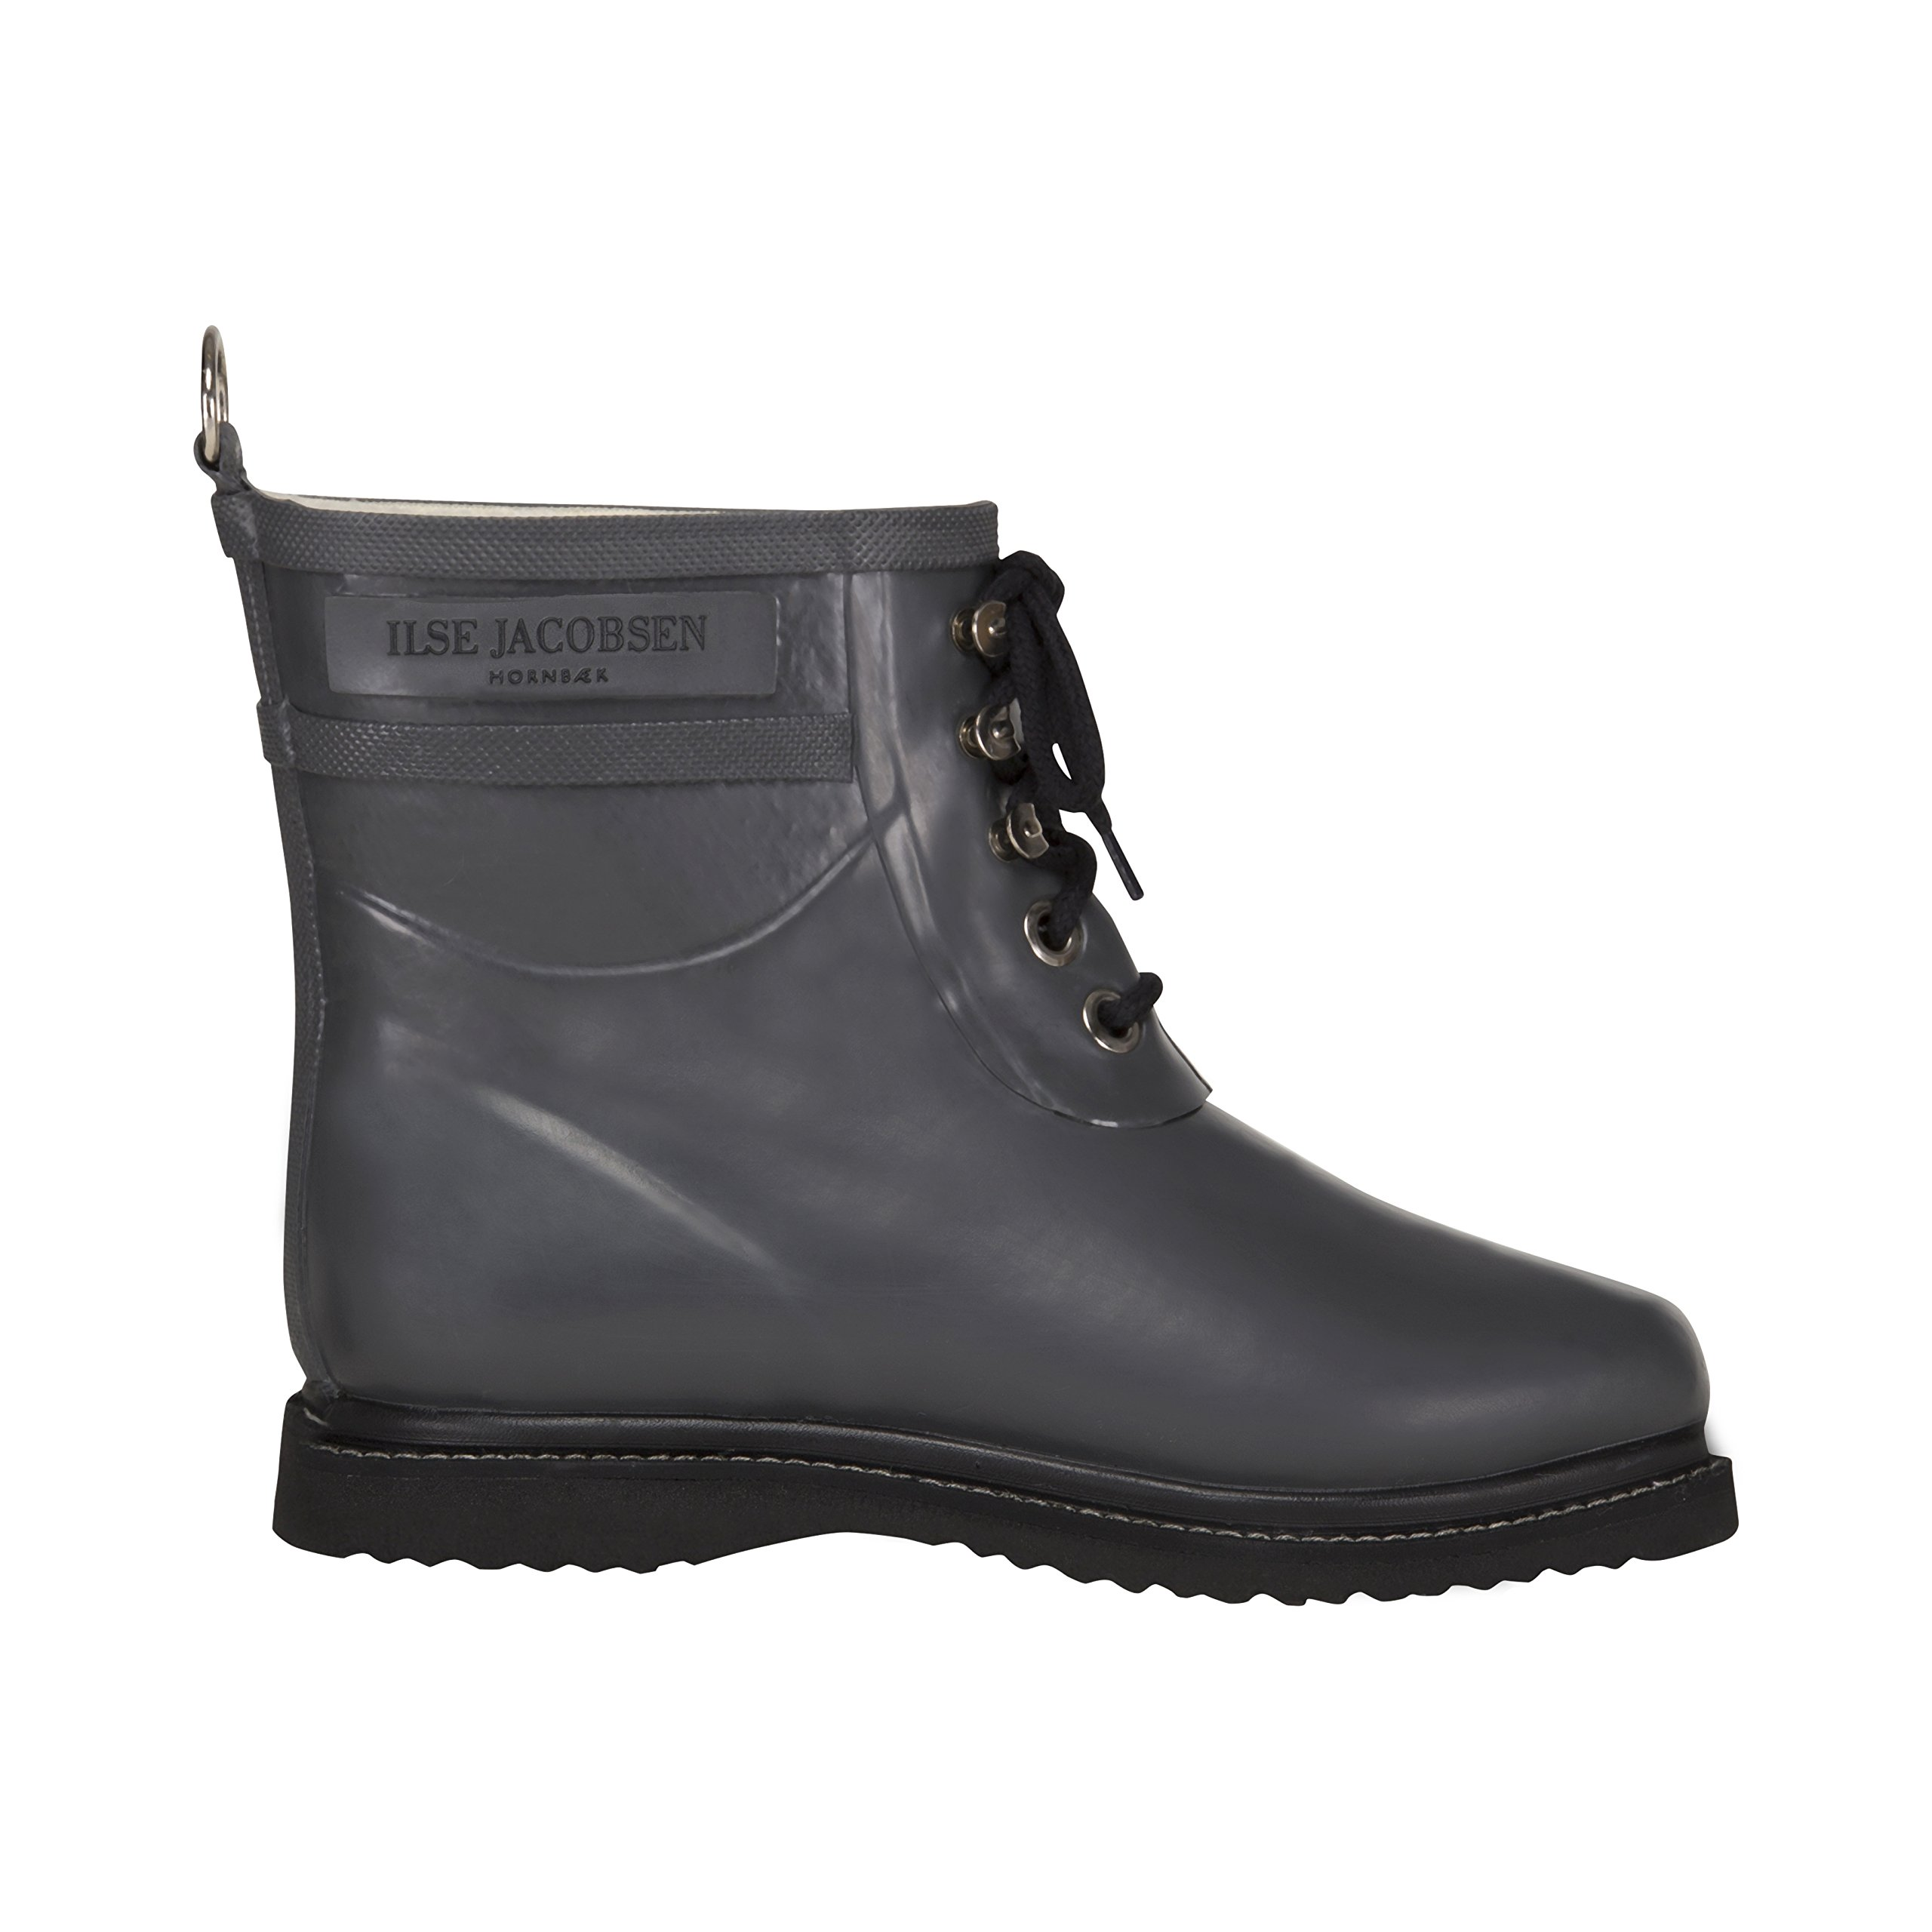 ILSE JACOBSEN Women's Rub 2 Rain Boot,Grey,38 EU/8 M US